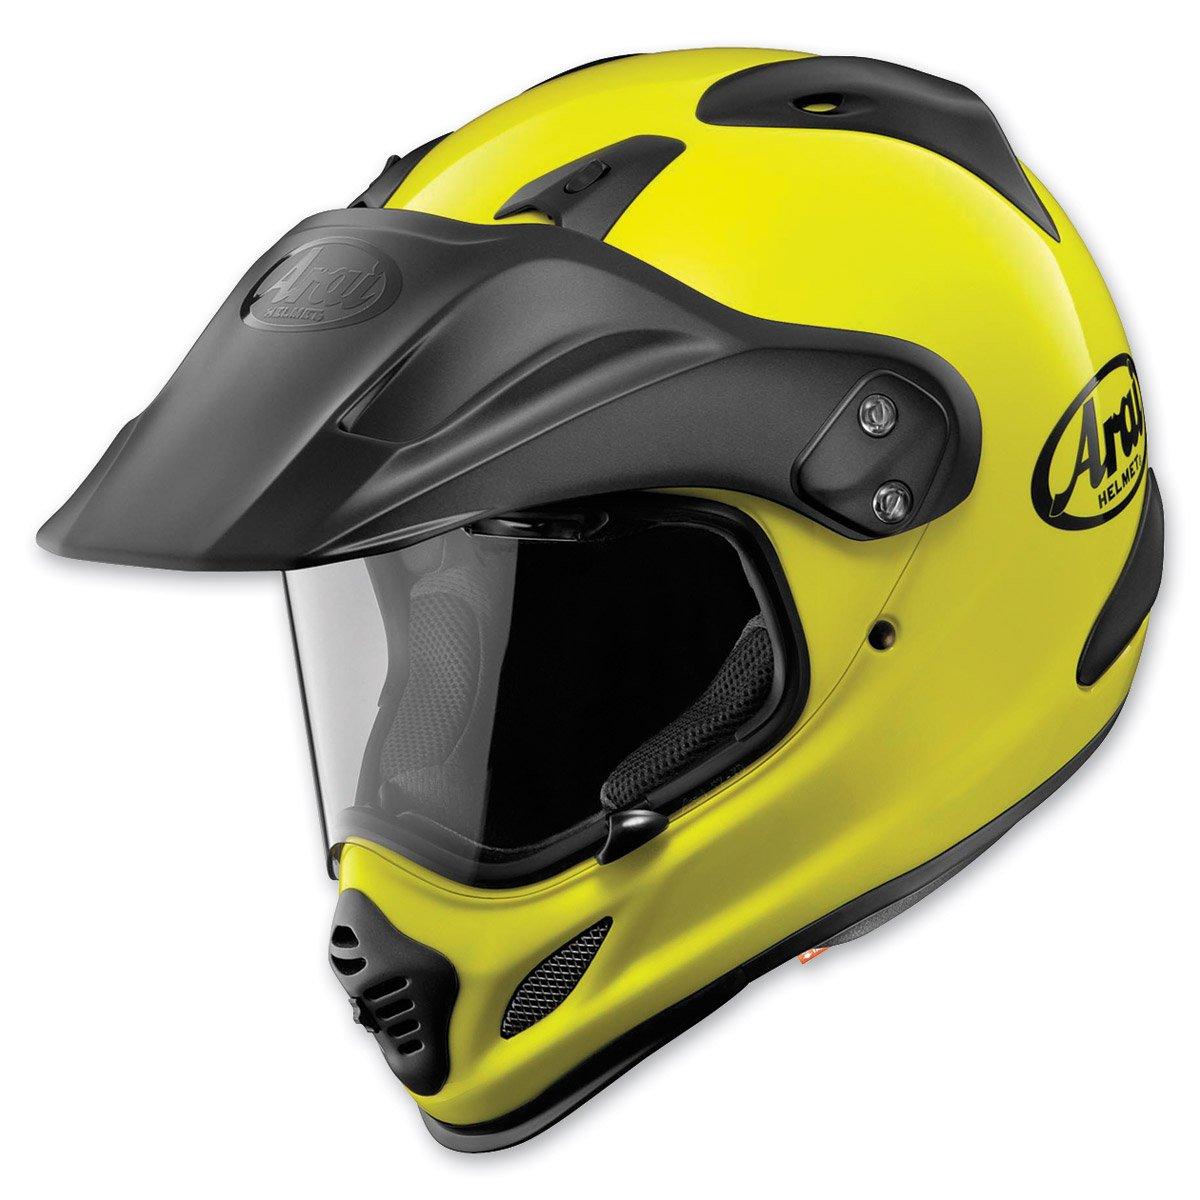 Arai XD4 Helmet (Fluorescent Yellow, Large)